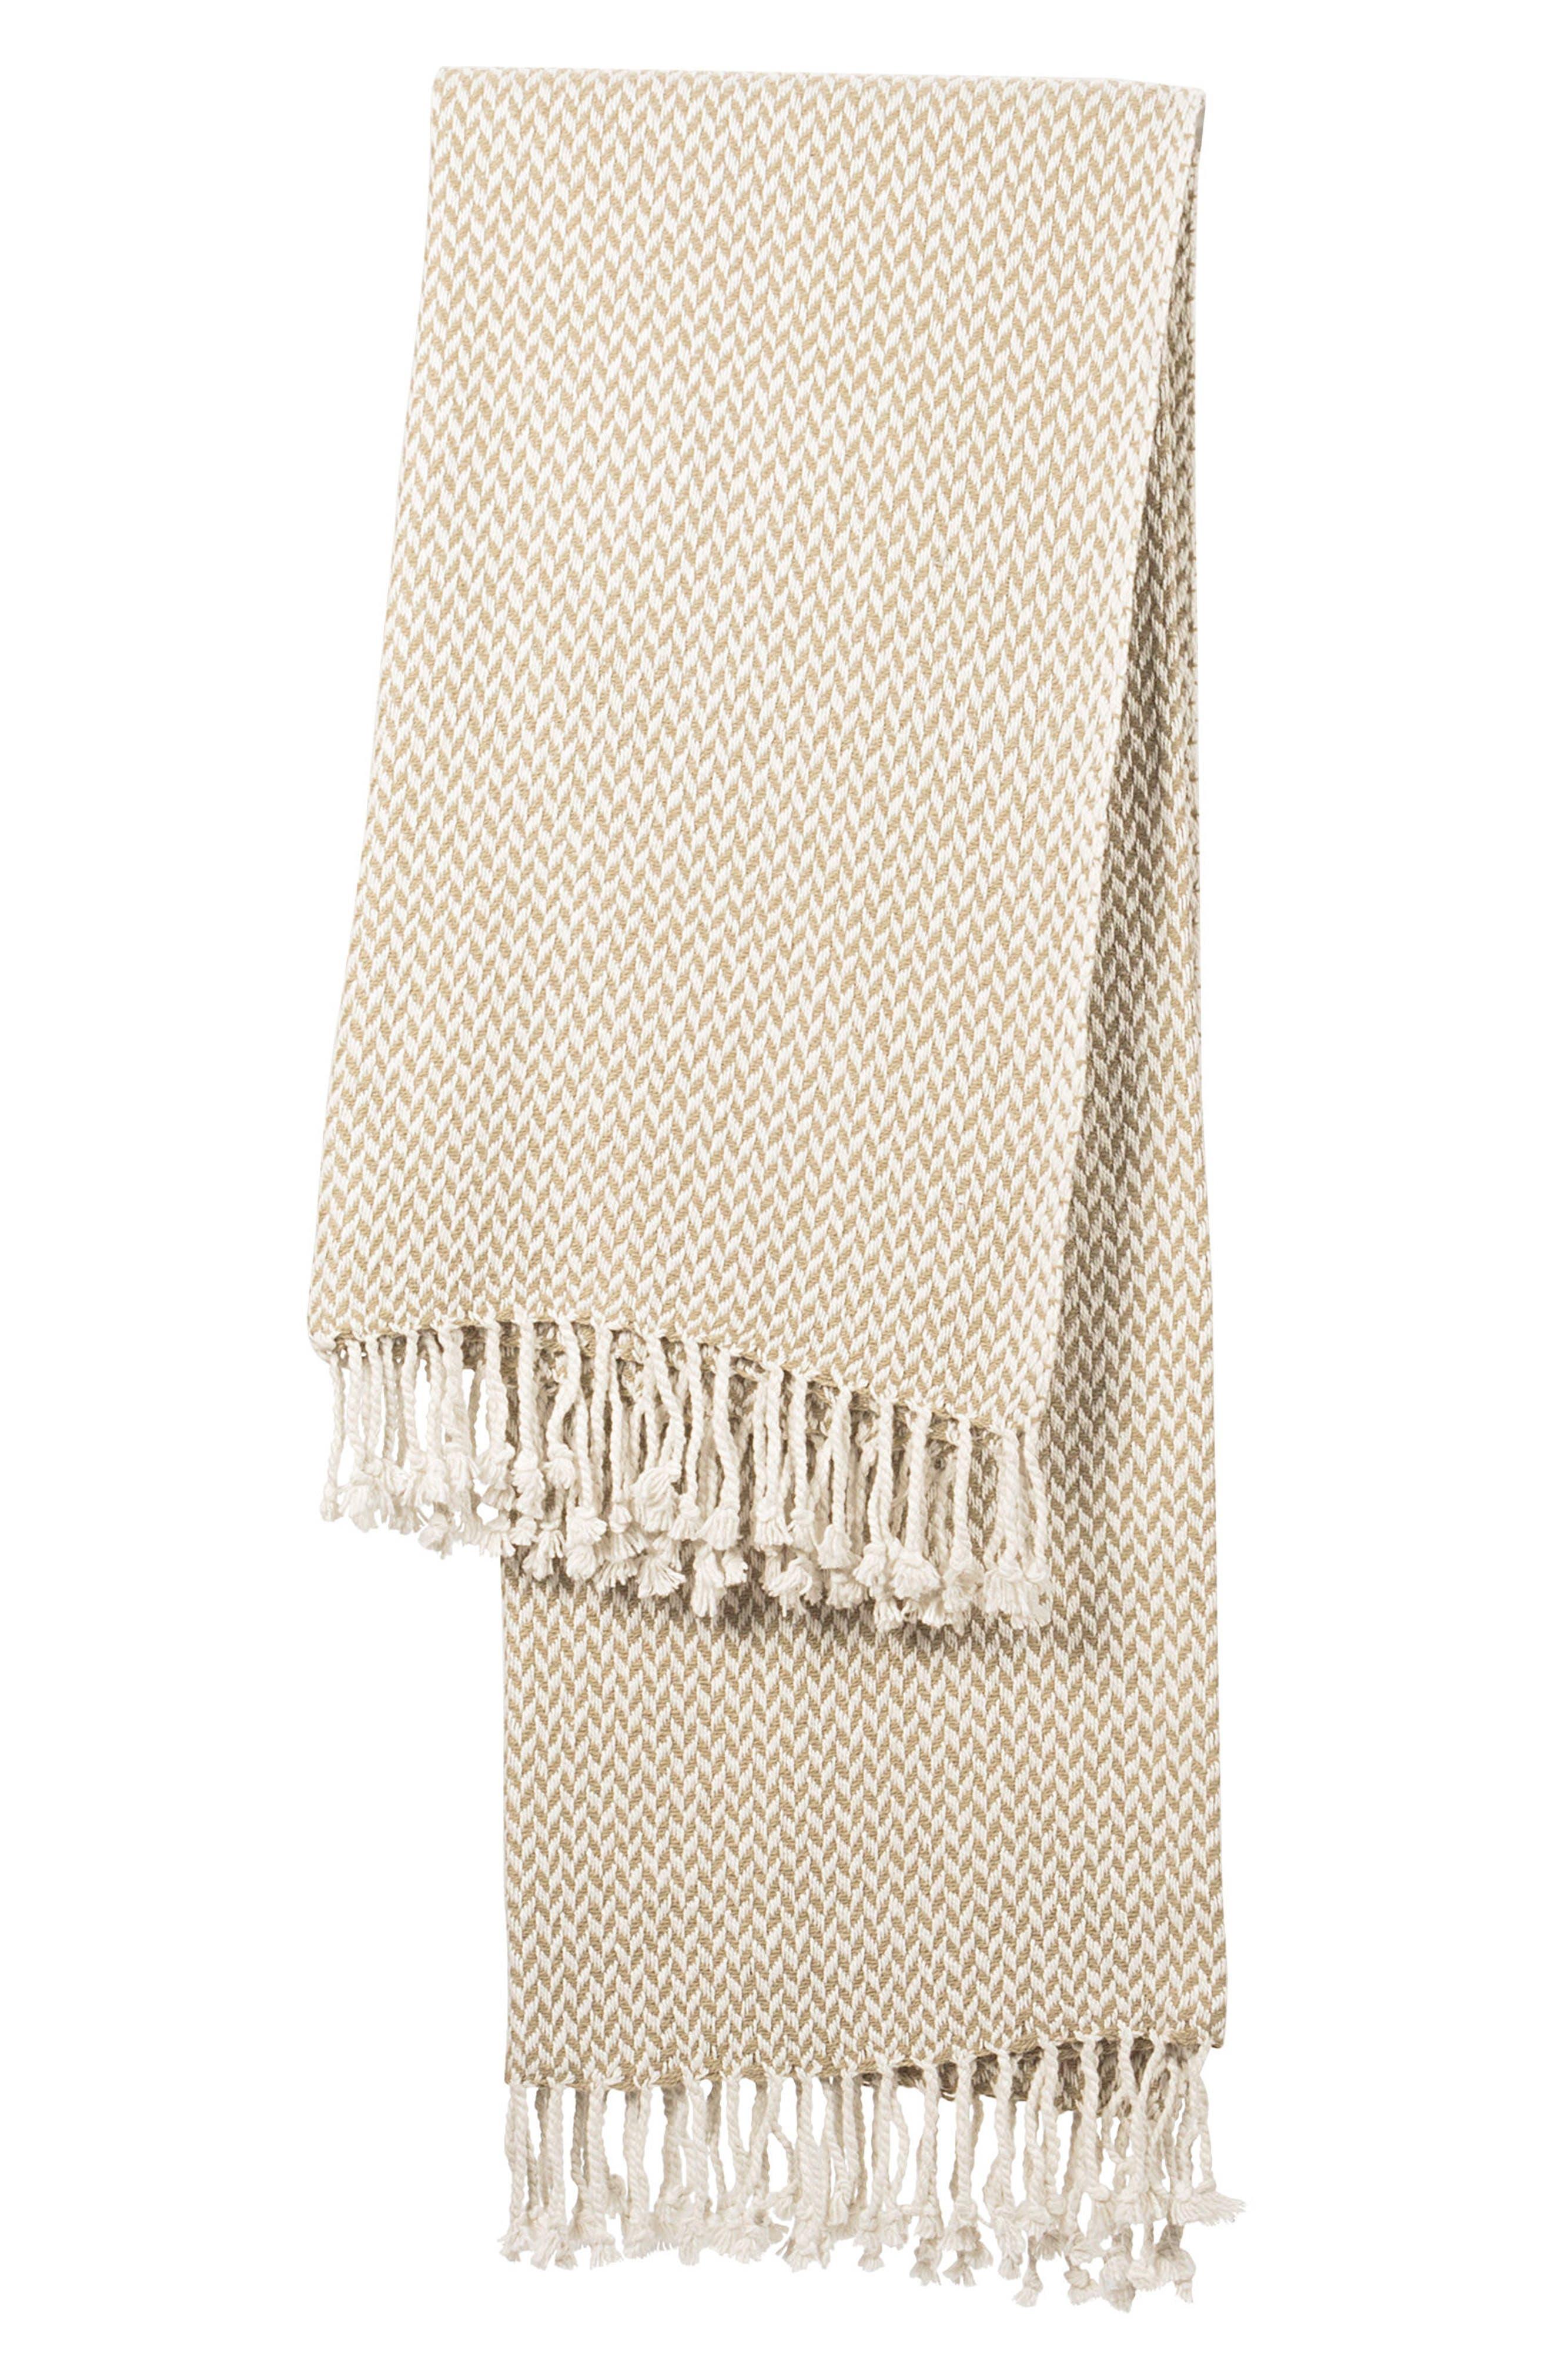 Monogram Herringbone Throw Blanket,                         Main,                         color, Taupe